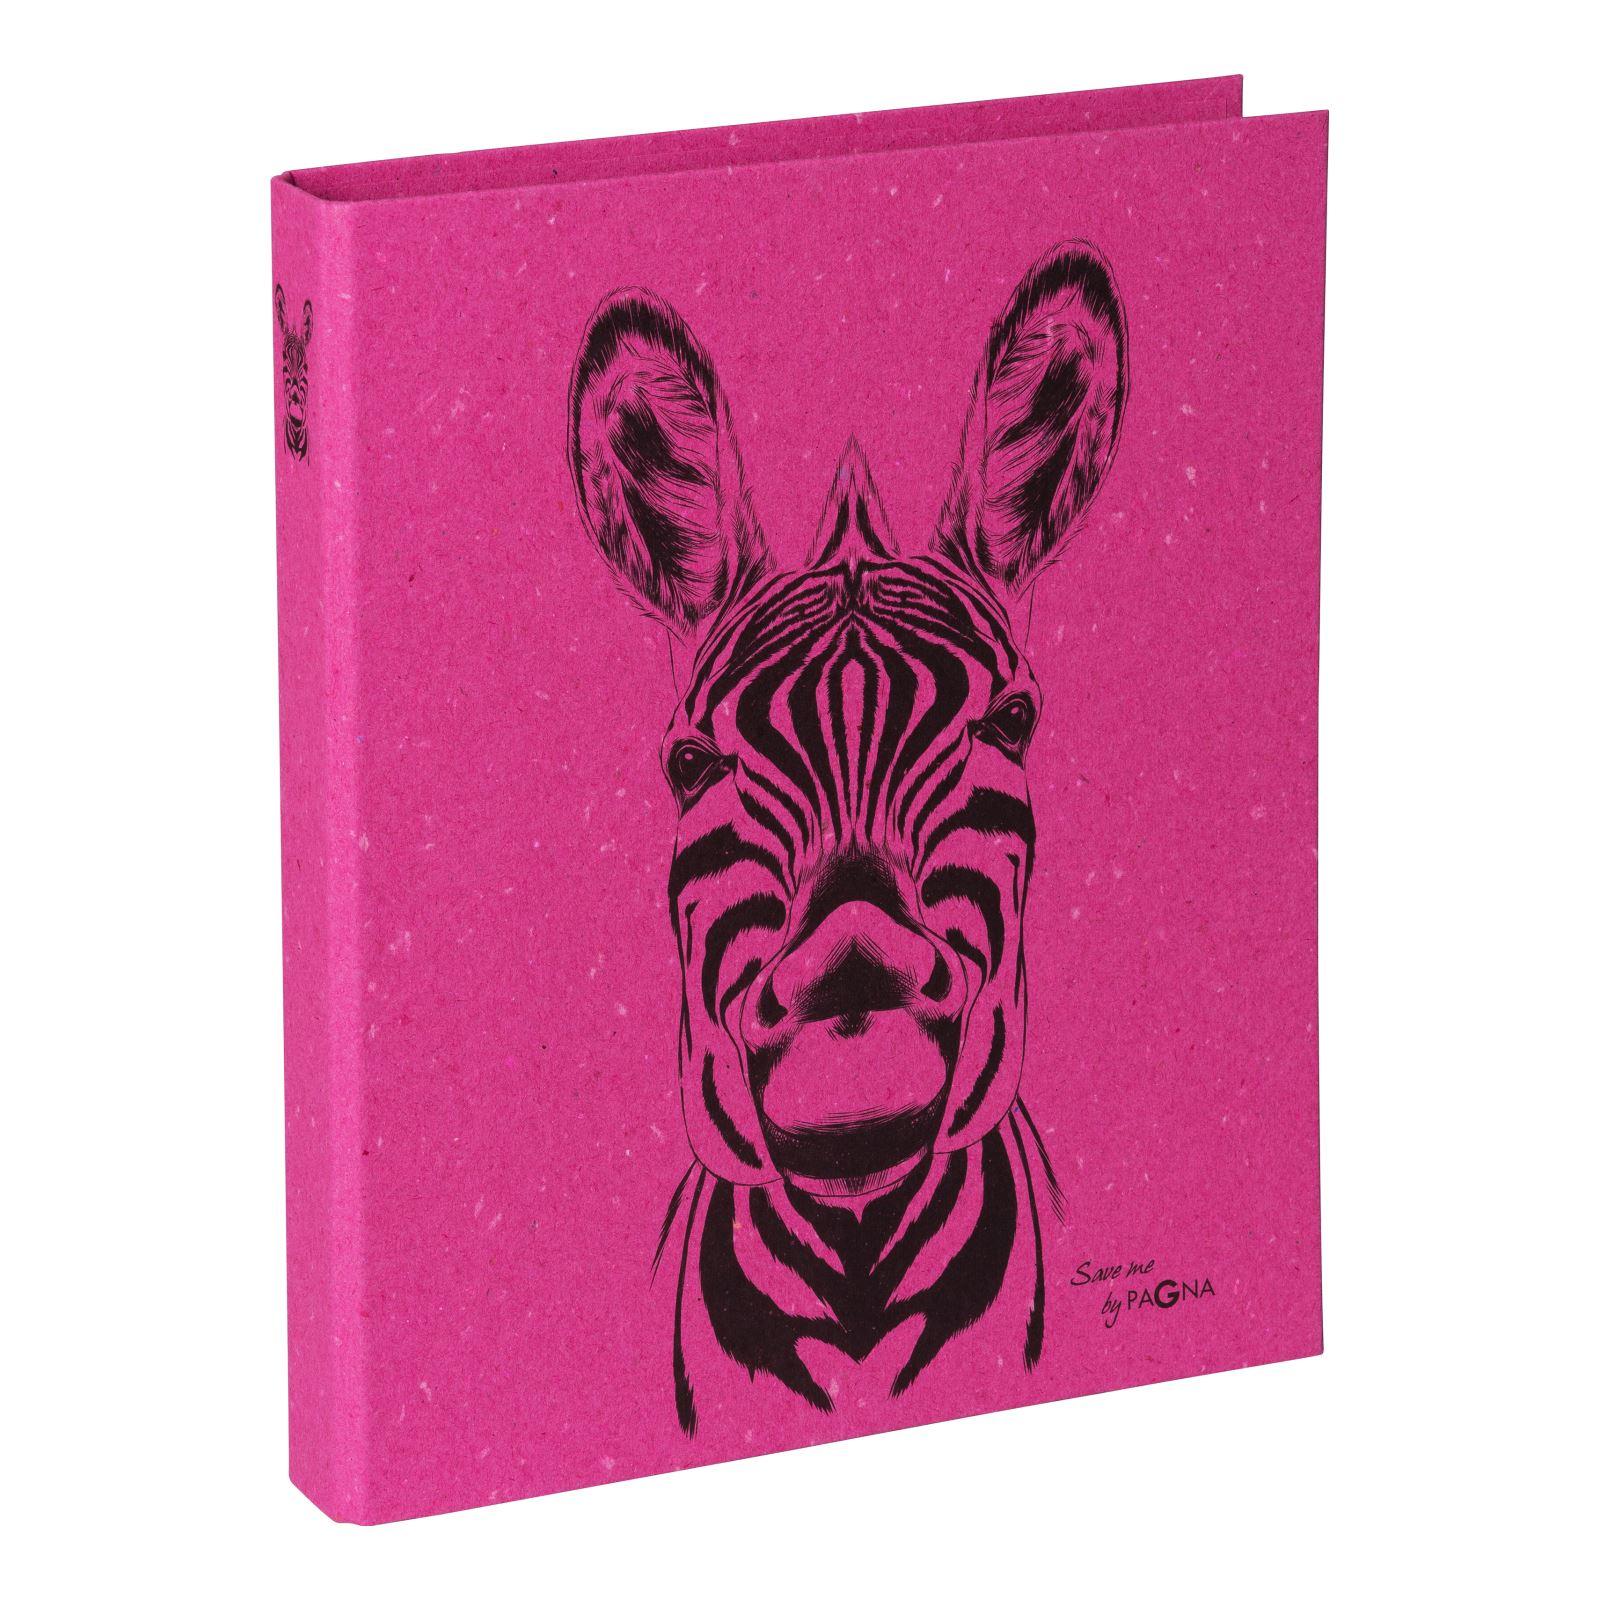 Pagna 20770-34 - Ringbuch - Ordner - DIN A4- Zebra Motiv